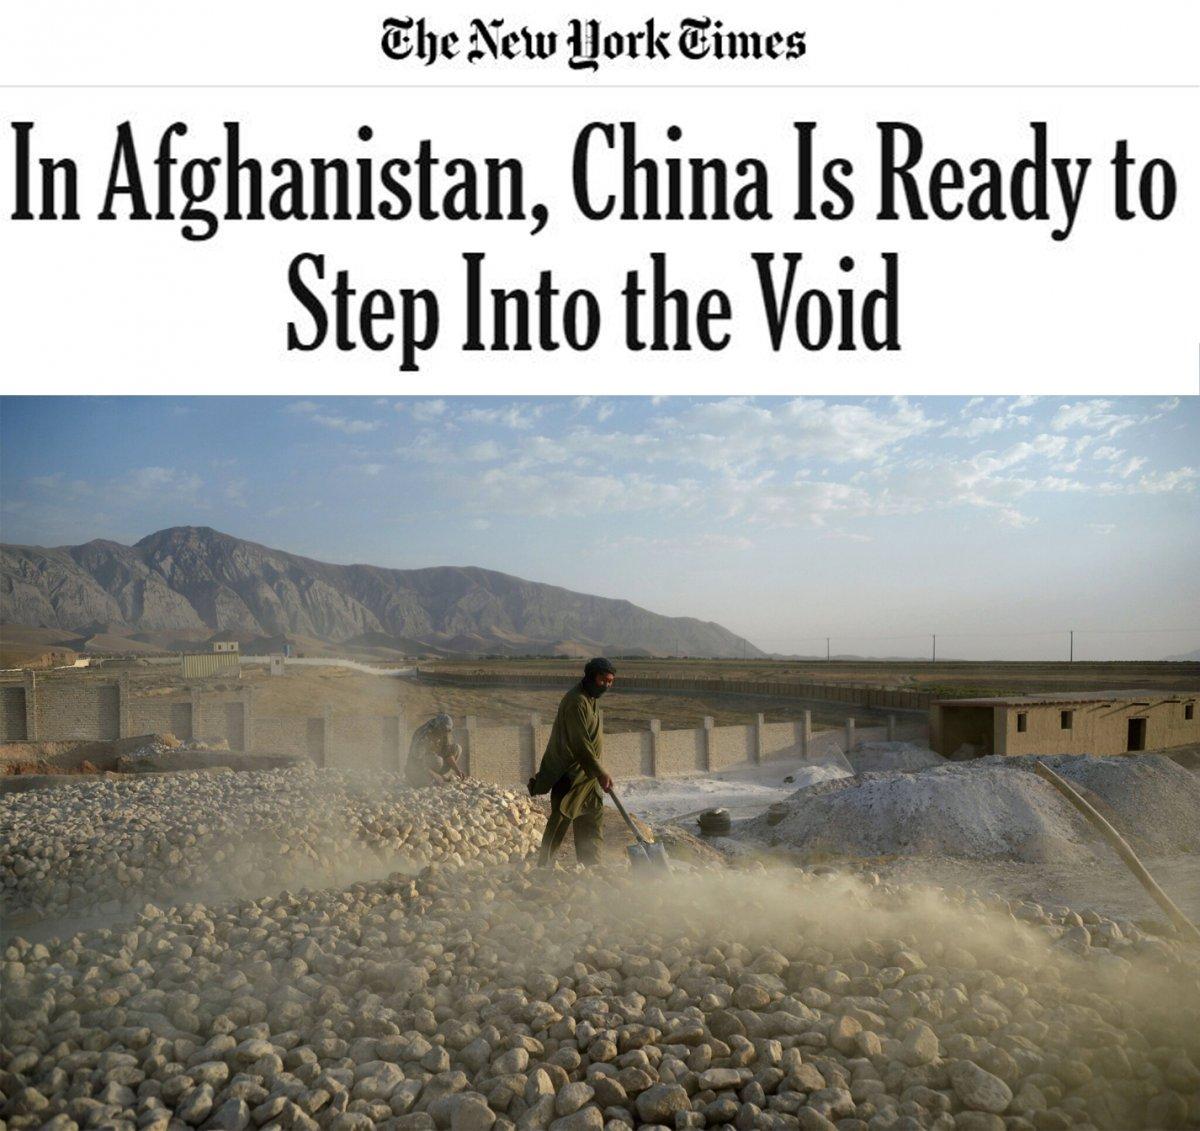 New York Times: Çin, Afganistan daki boşluğu doldurmaya hazır #2